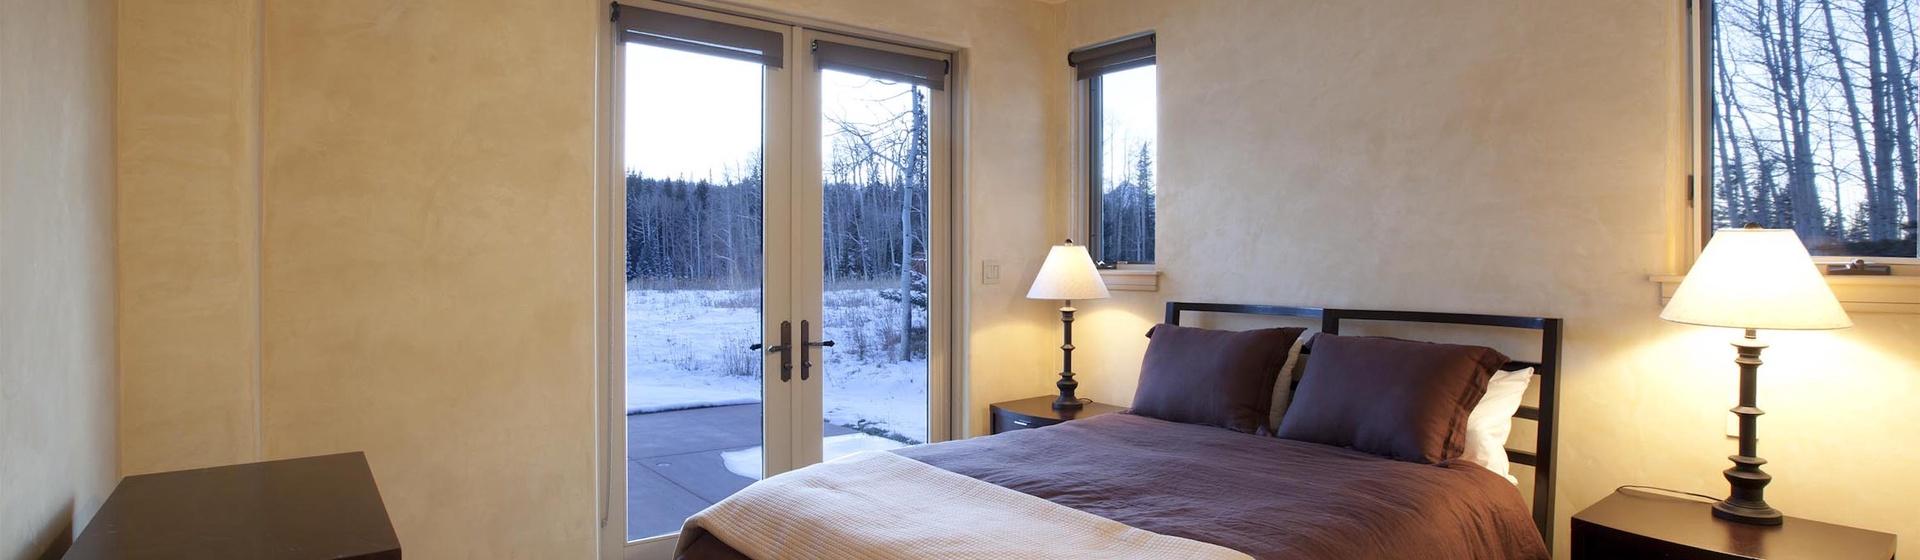 8.07-mountain-village-hood-park-manor-guest-house-bedroom-track.jpg